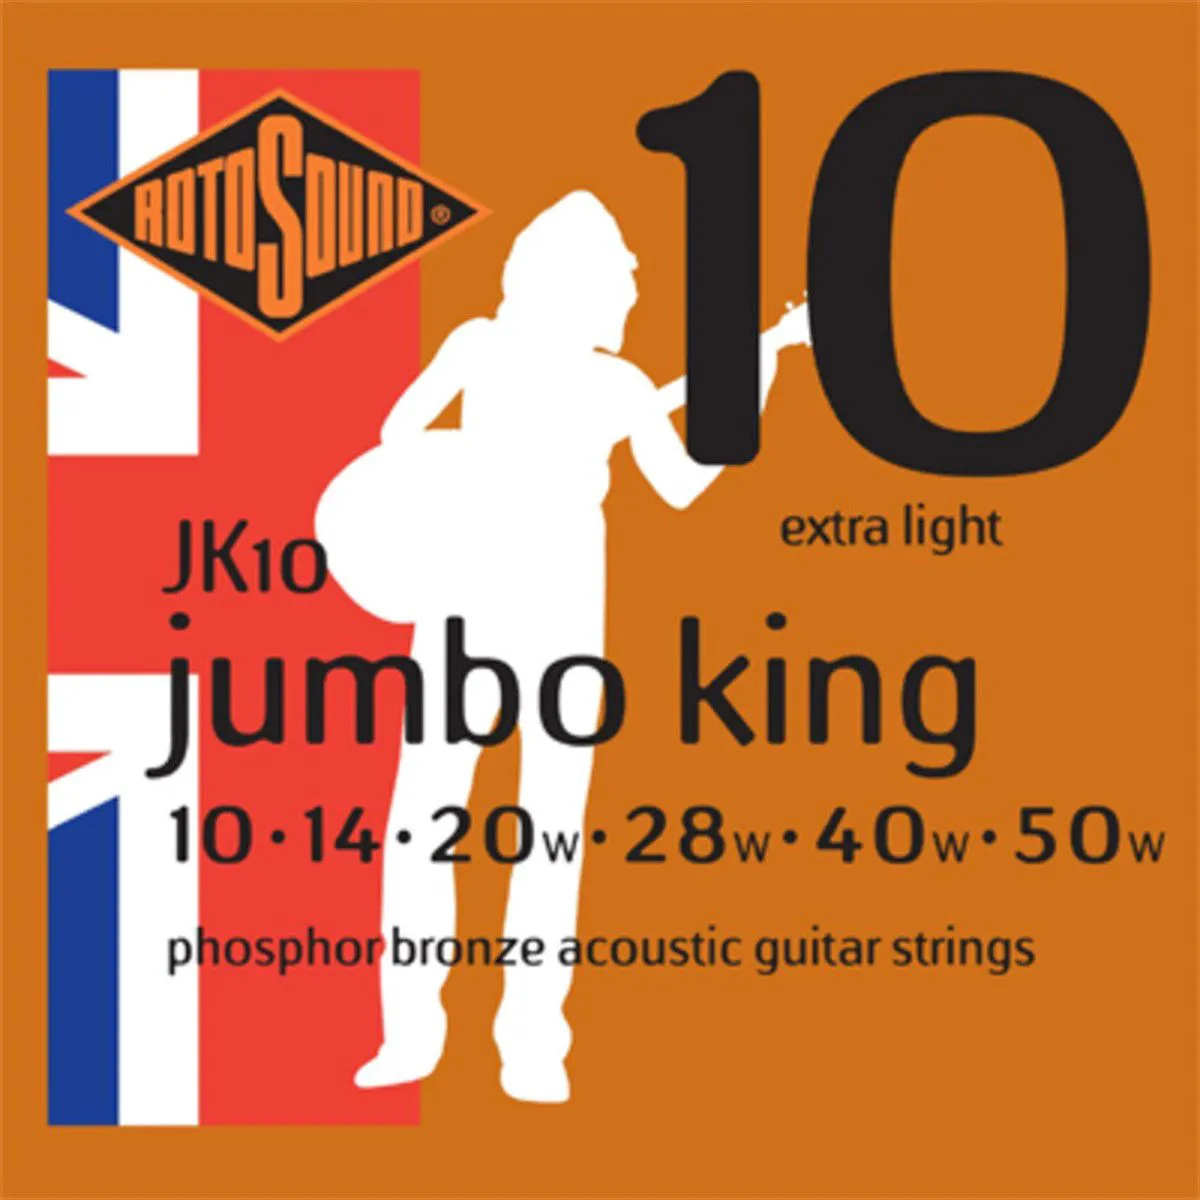 Encordoamento Rotosound JK10 Jumbo King 010/050 para Violão